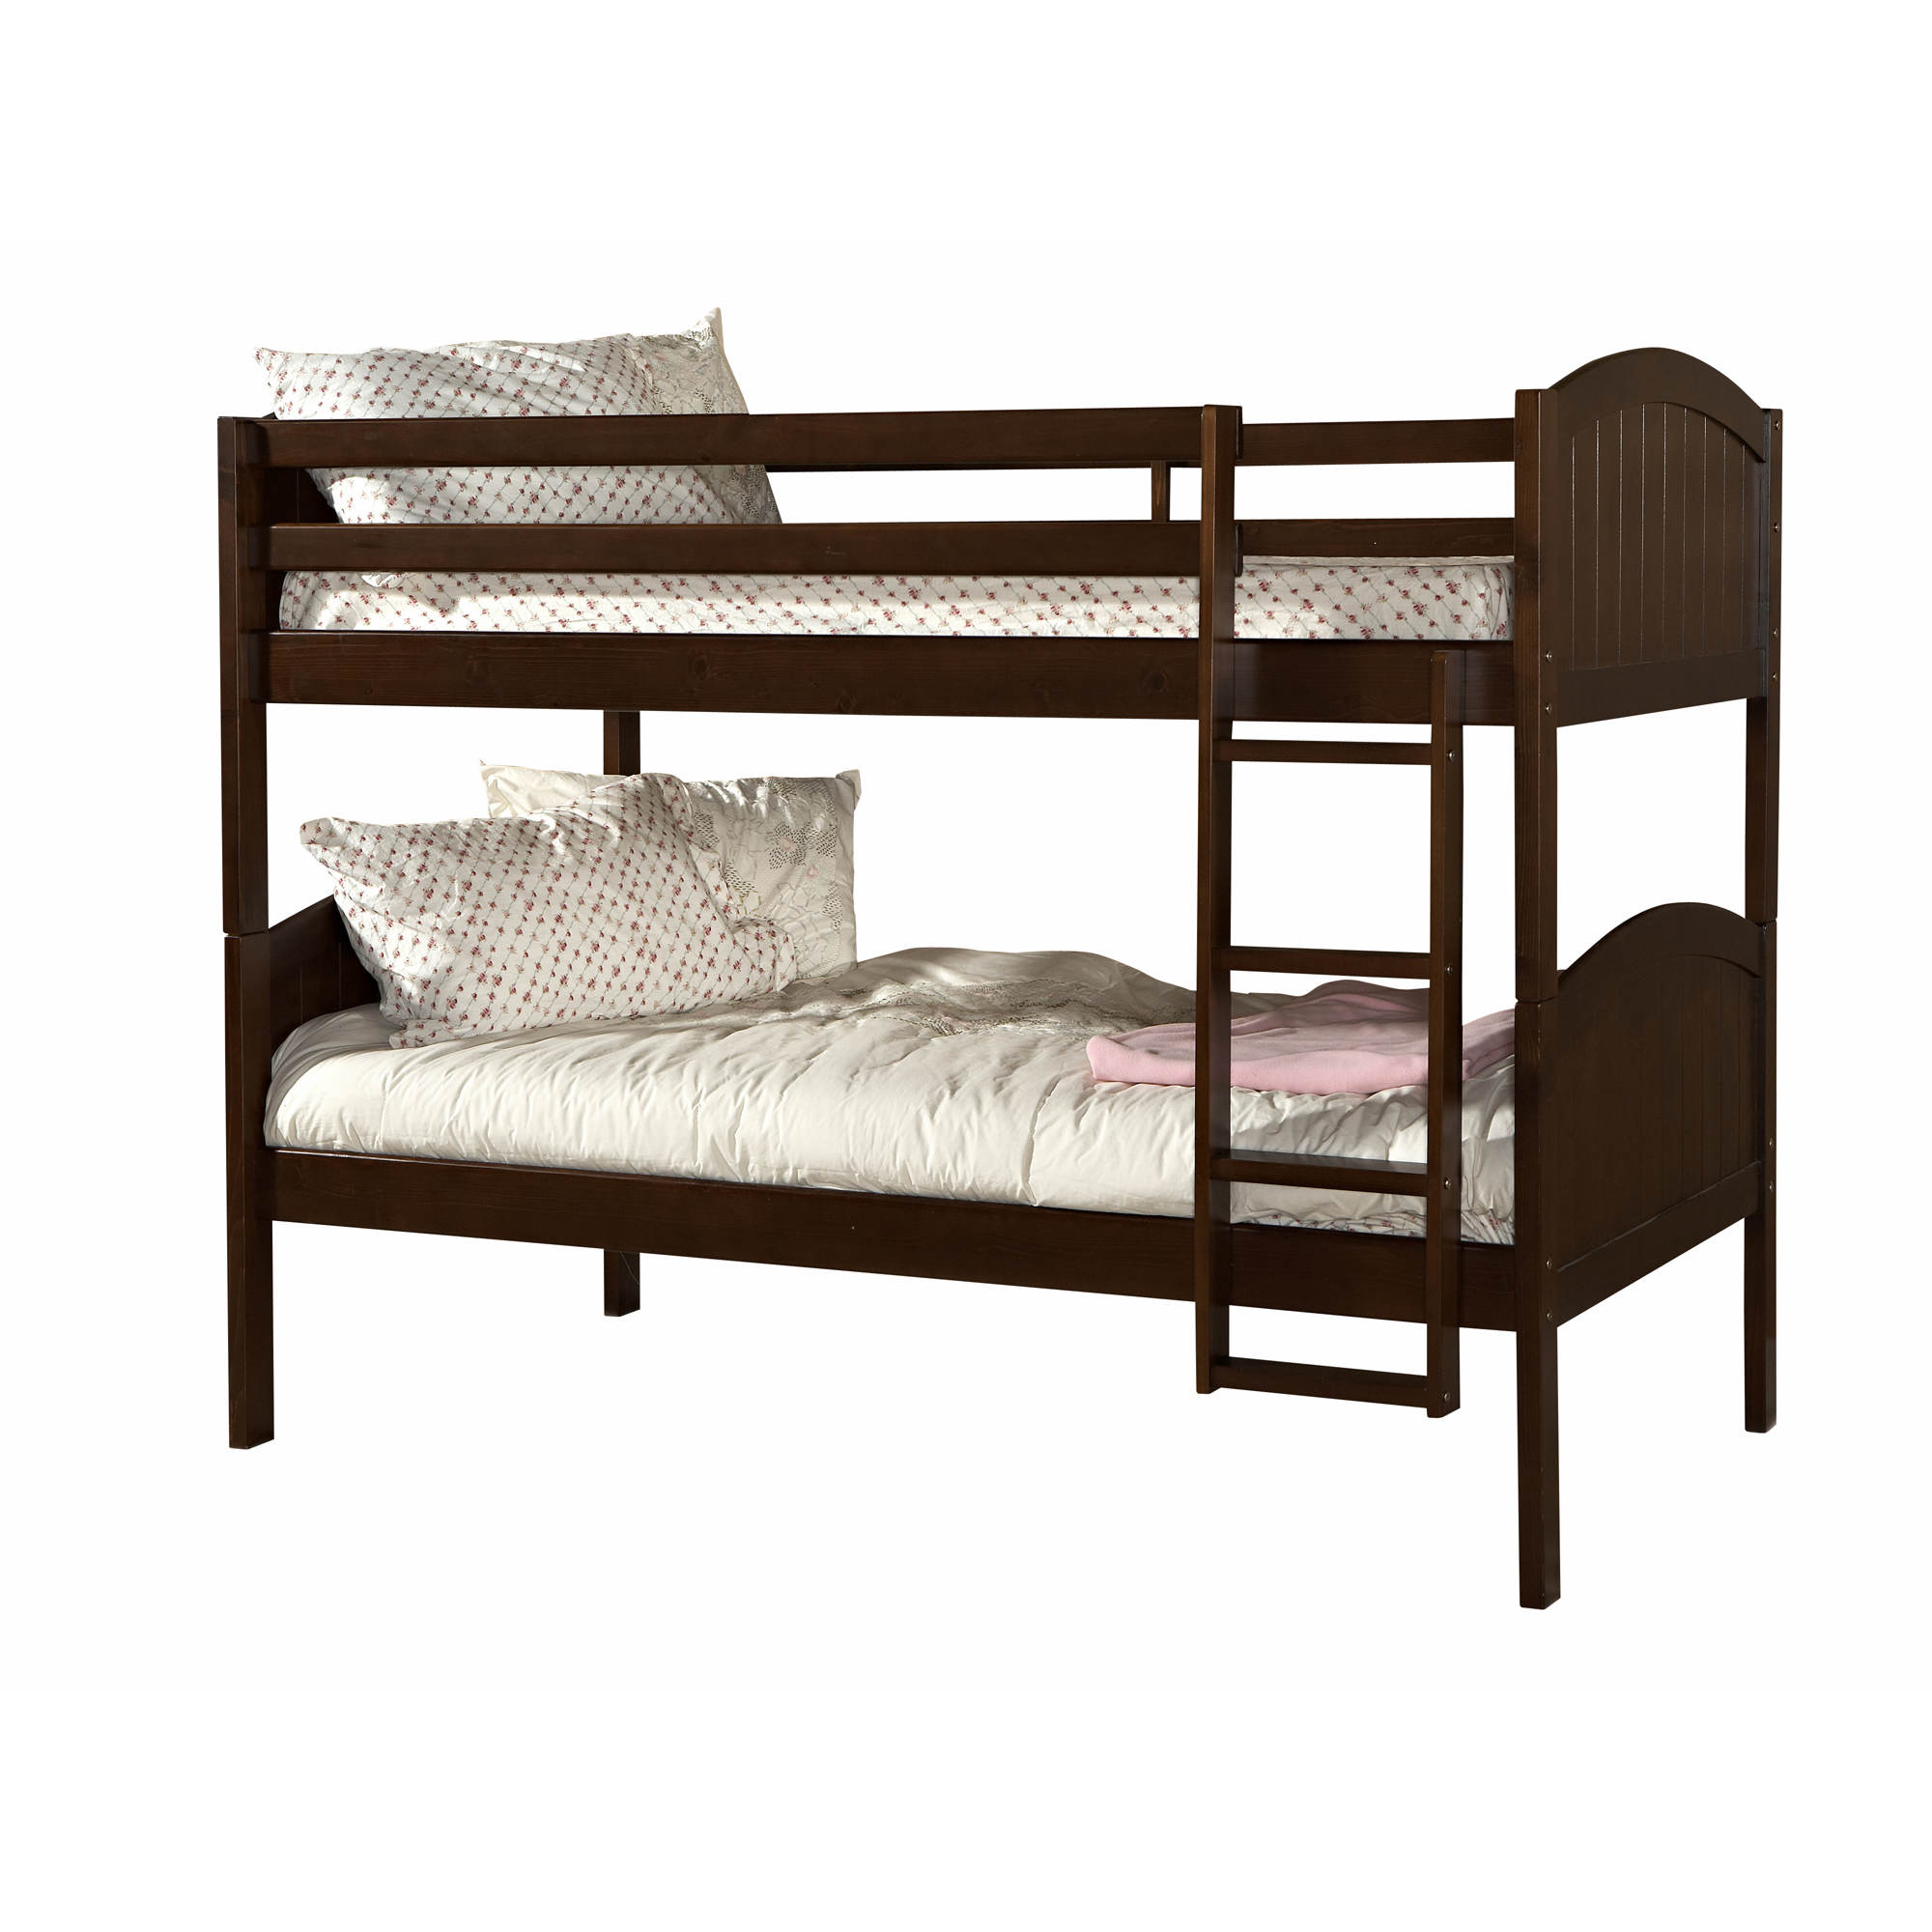 bjs for discount bargaintown s designs dallas cheap modern design furniture sofa breathtaking plano stores furnitu mattress fort in home texas bj warehouse worth